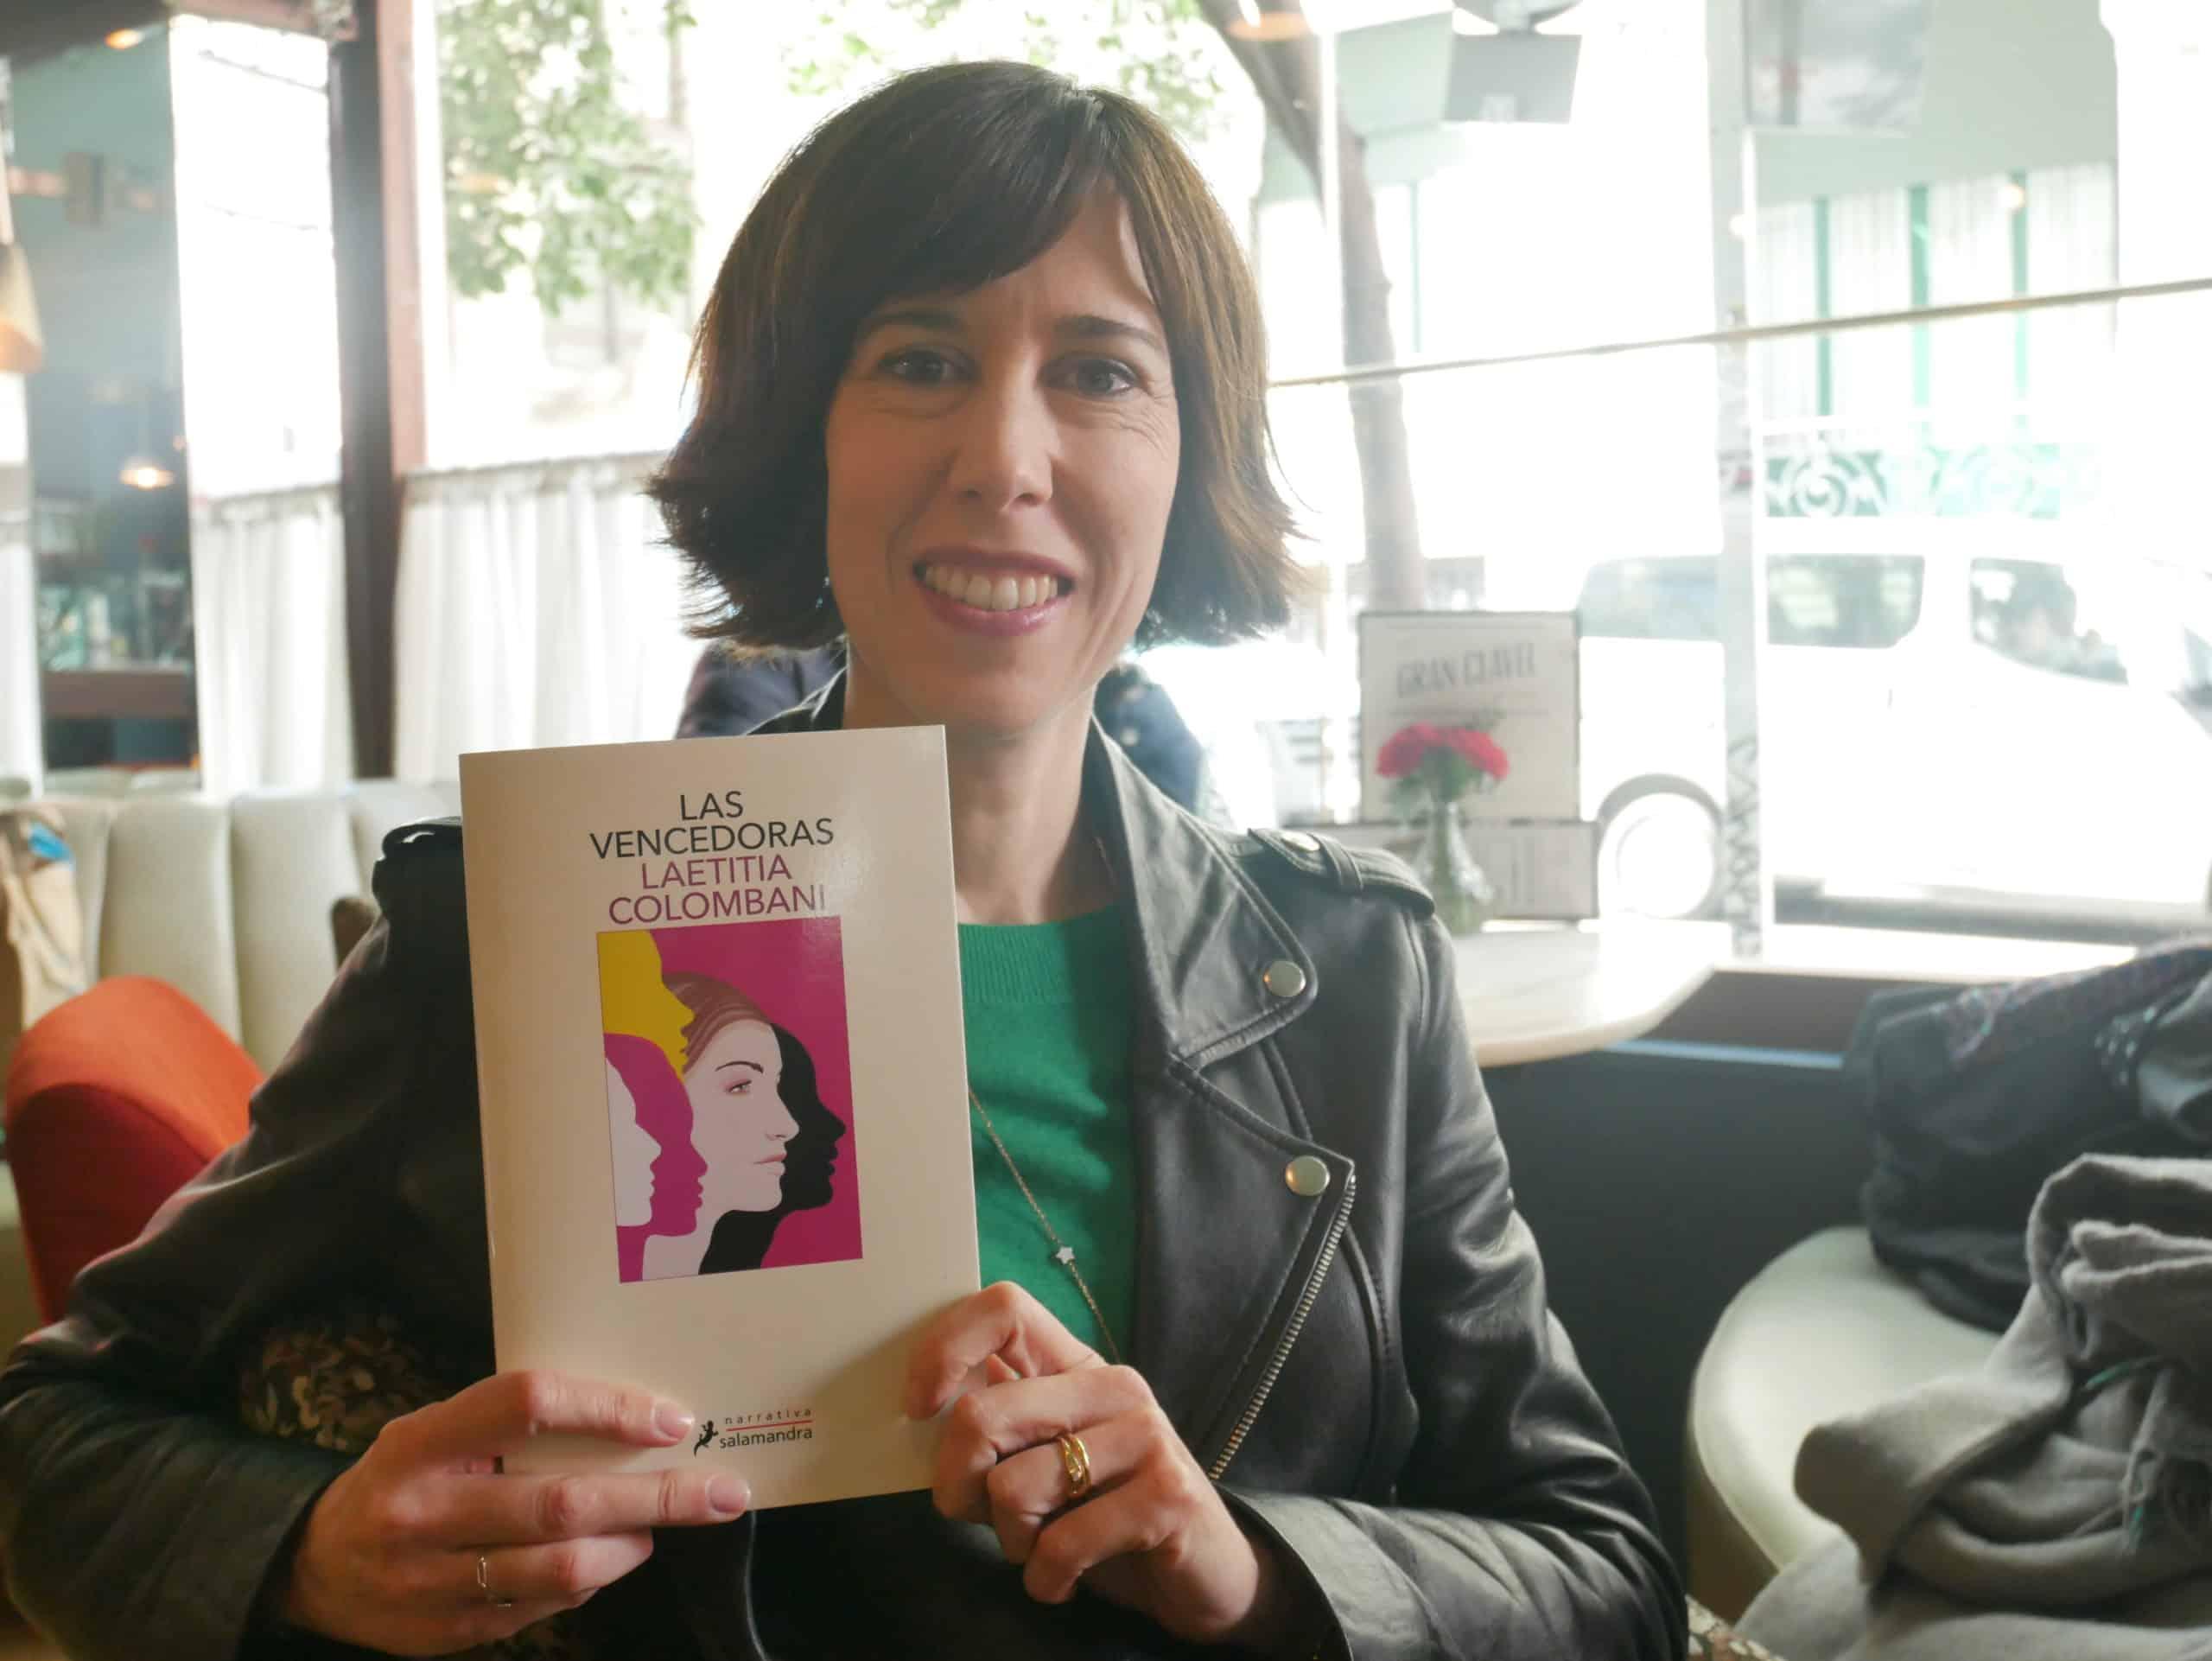 Reseña de Las vencedoras de Laetitia Colombani